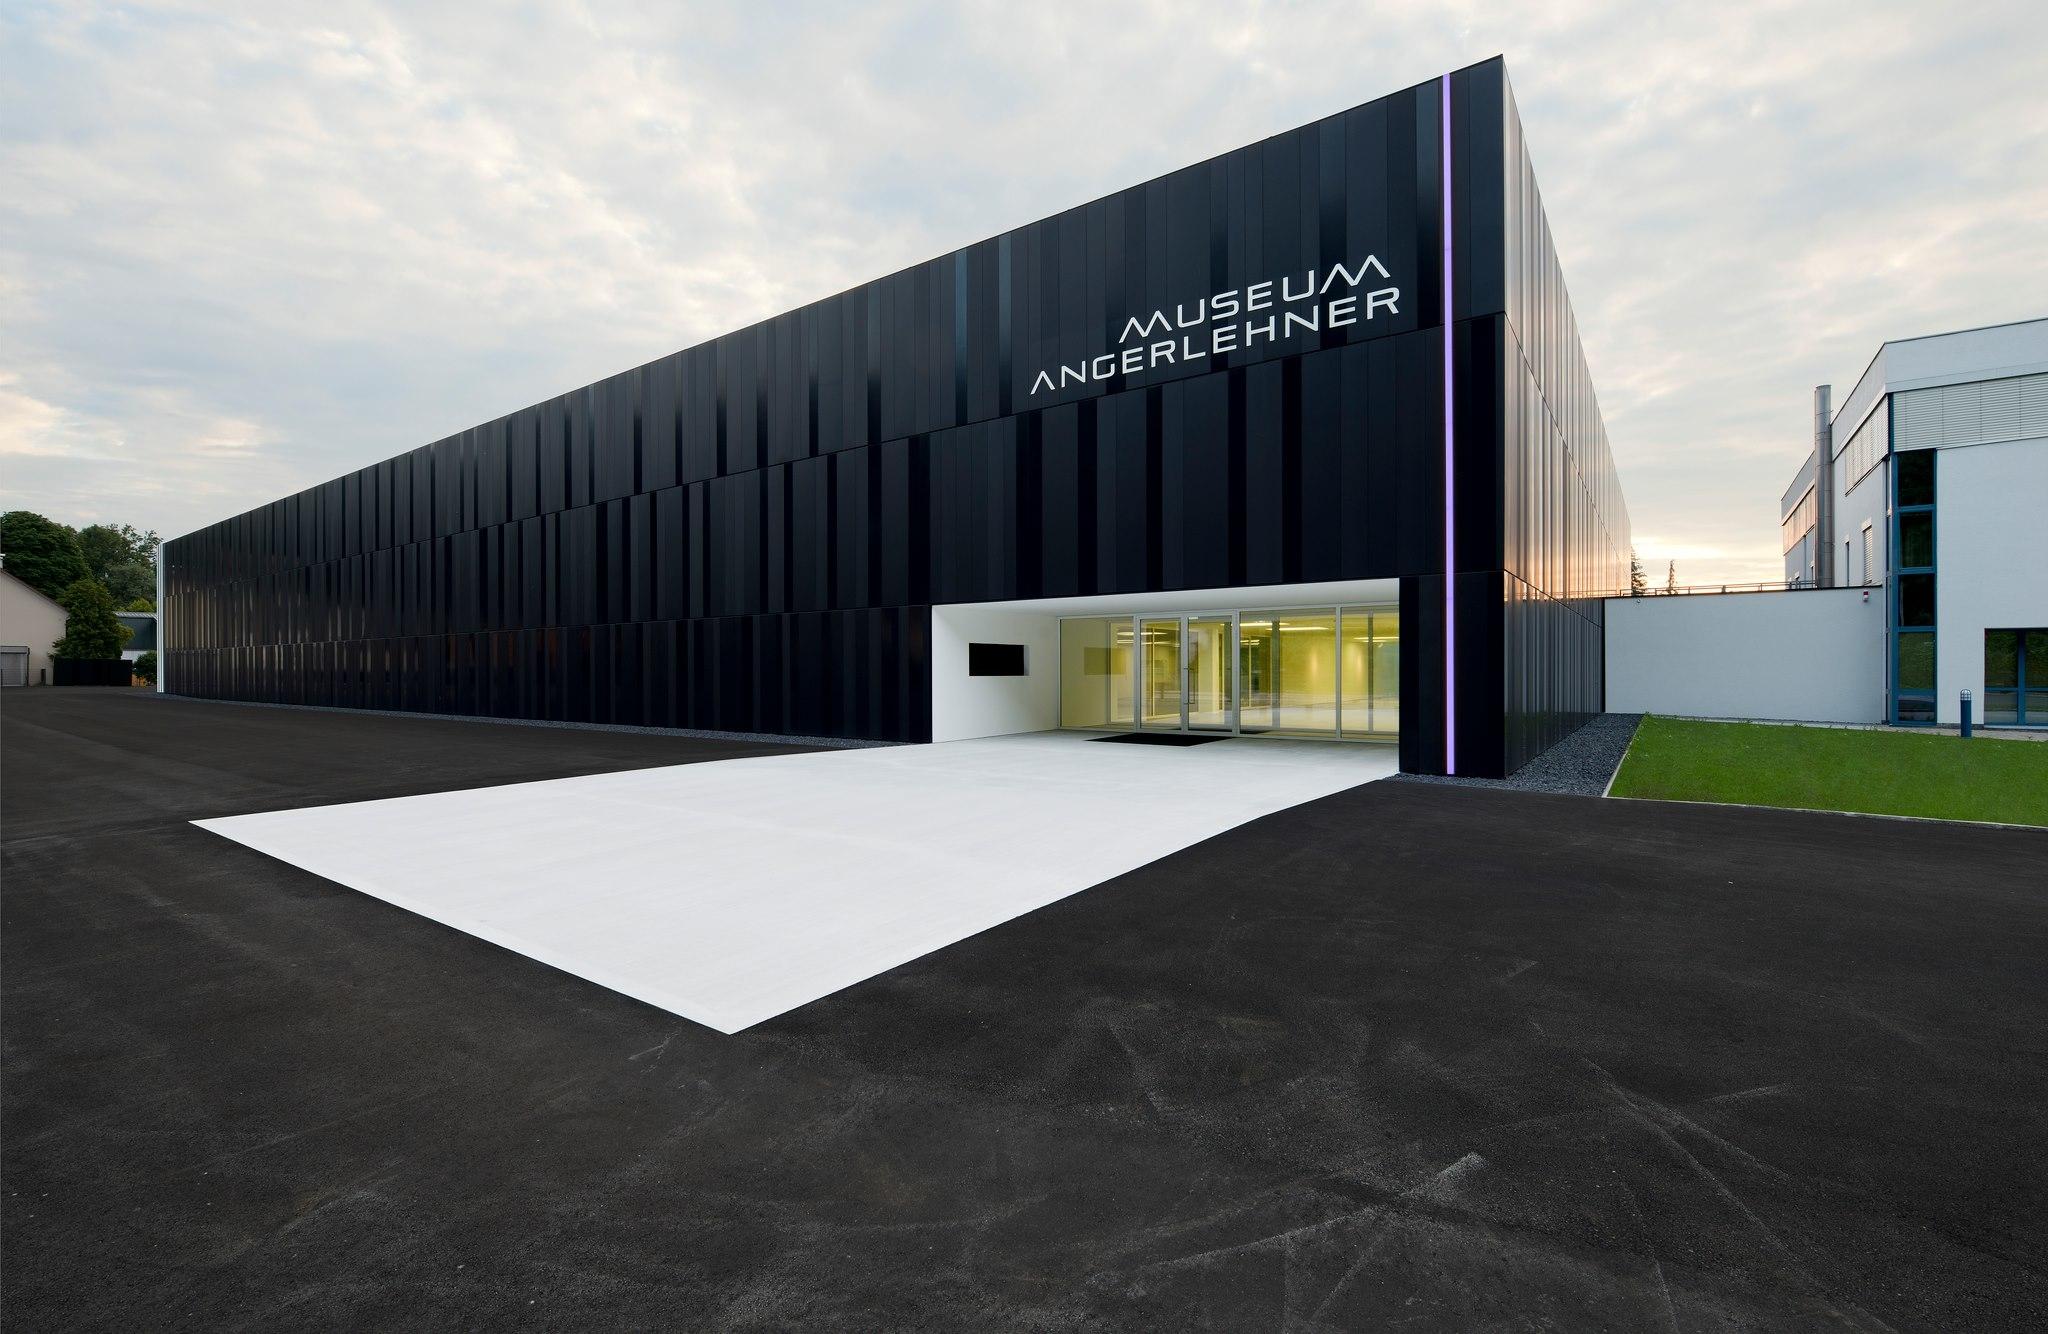 Bild der Angerlehner Museums GmbH